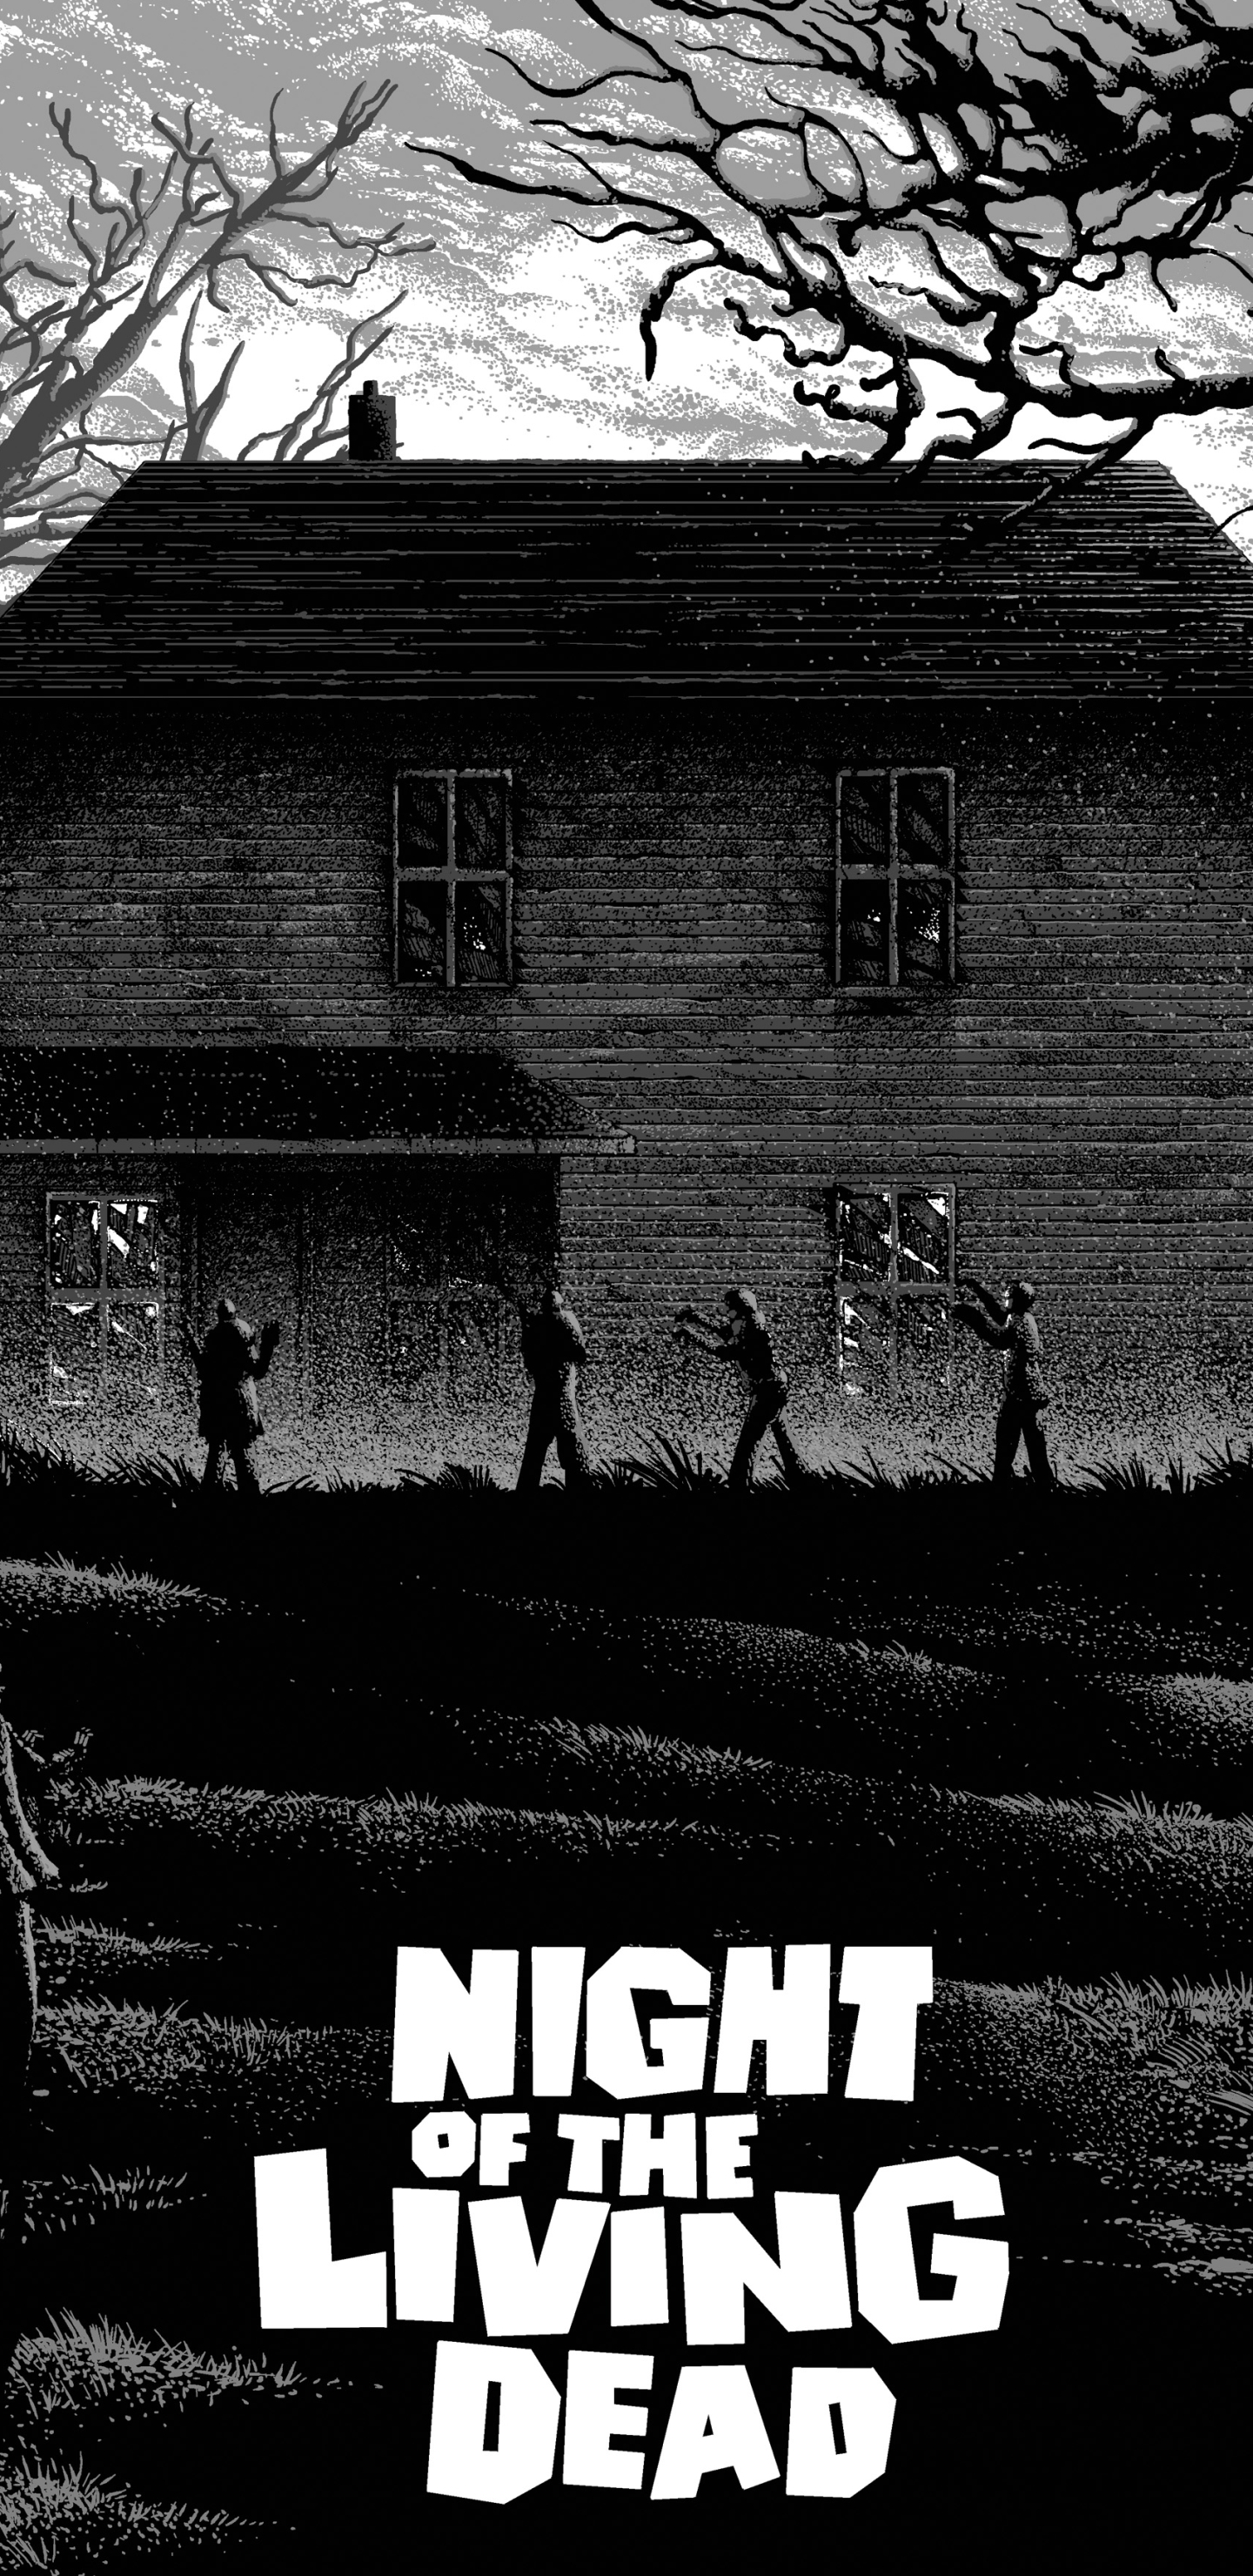 Movienight Of The Living Dead 1440x2960 Wallpaper Id